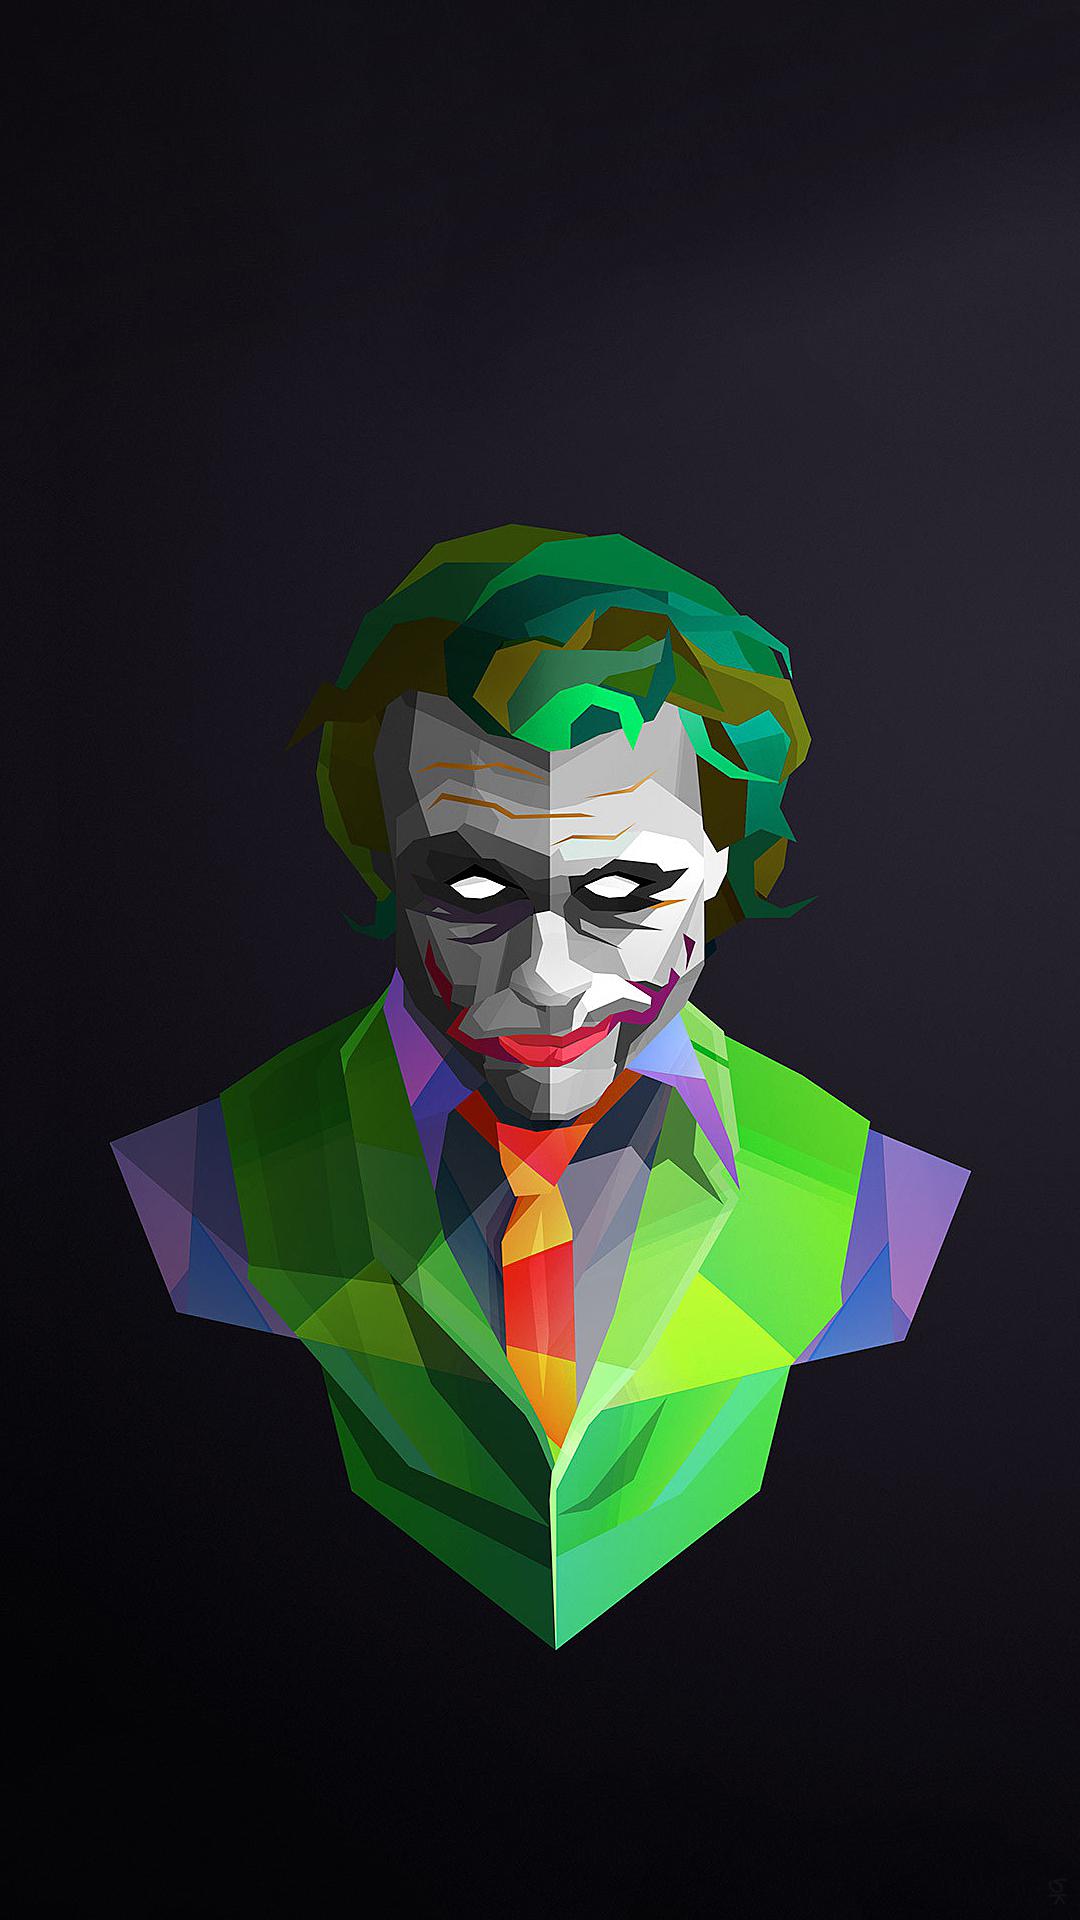 Joker iPhone 6 Plus Wallpaper (1080x1920)